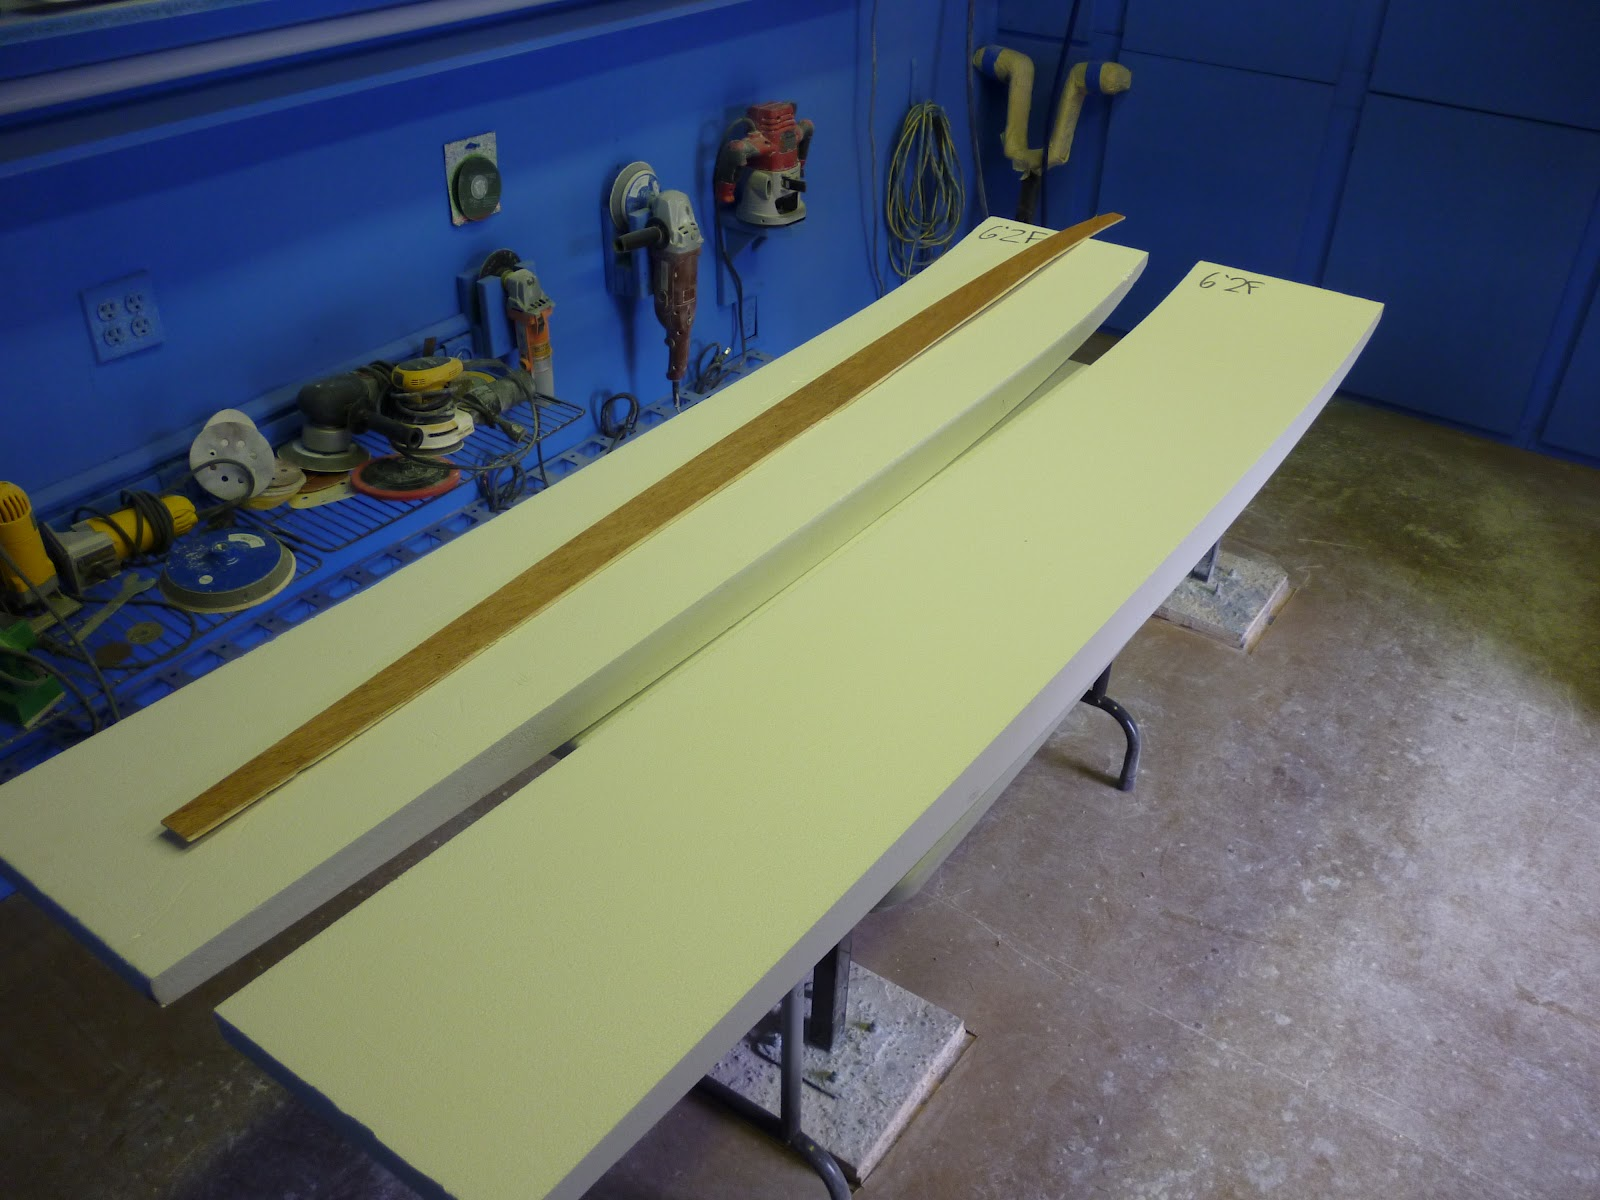 longboard template maker - don woodruff surfboards new project wakesurf mini